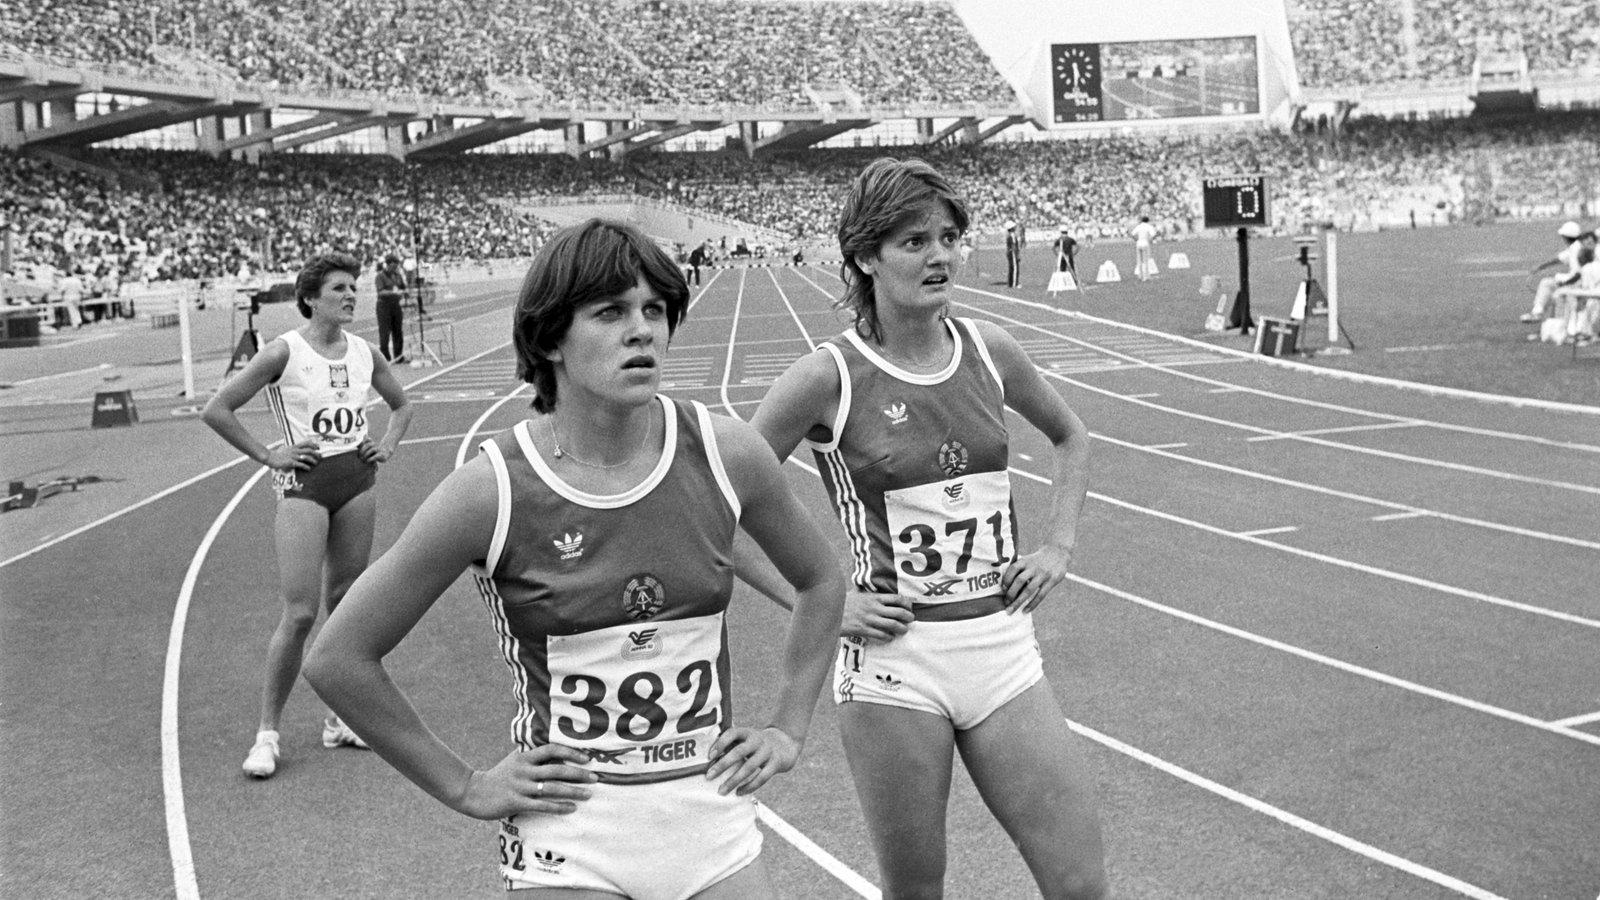 Doping Sportler